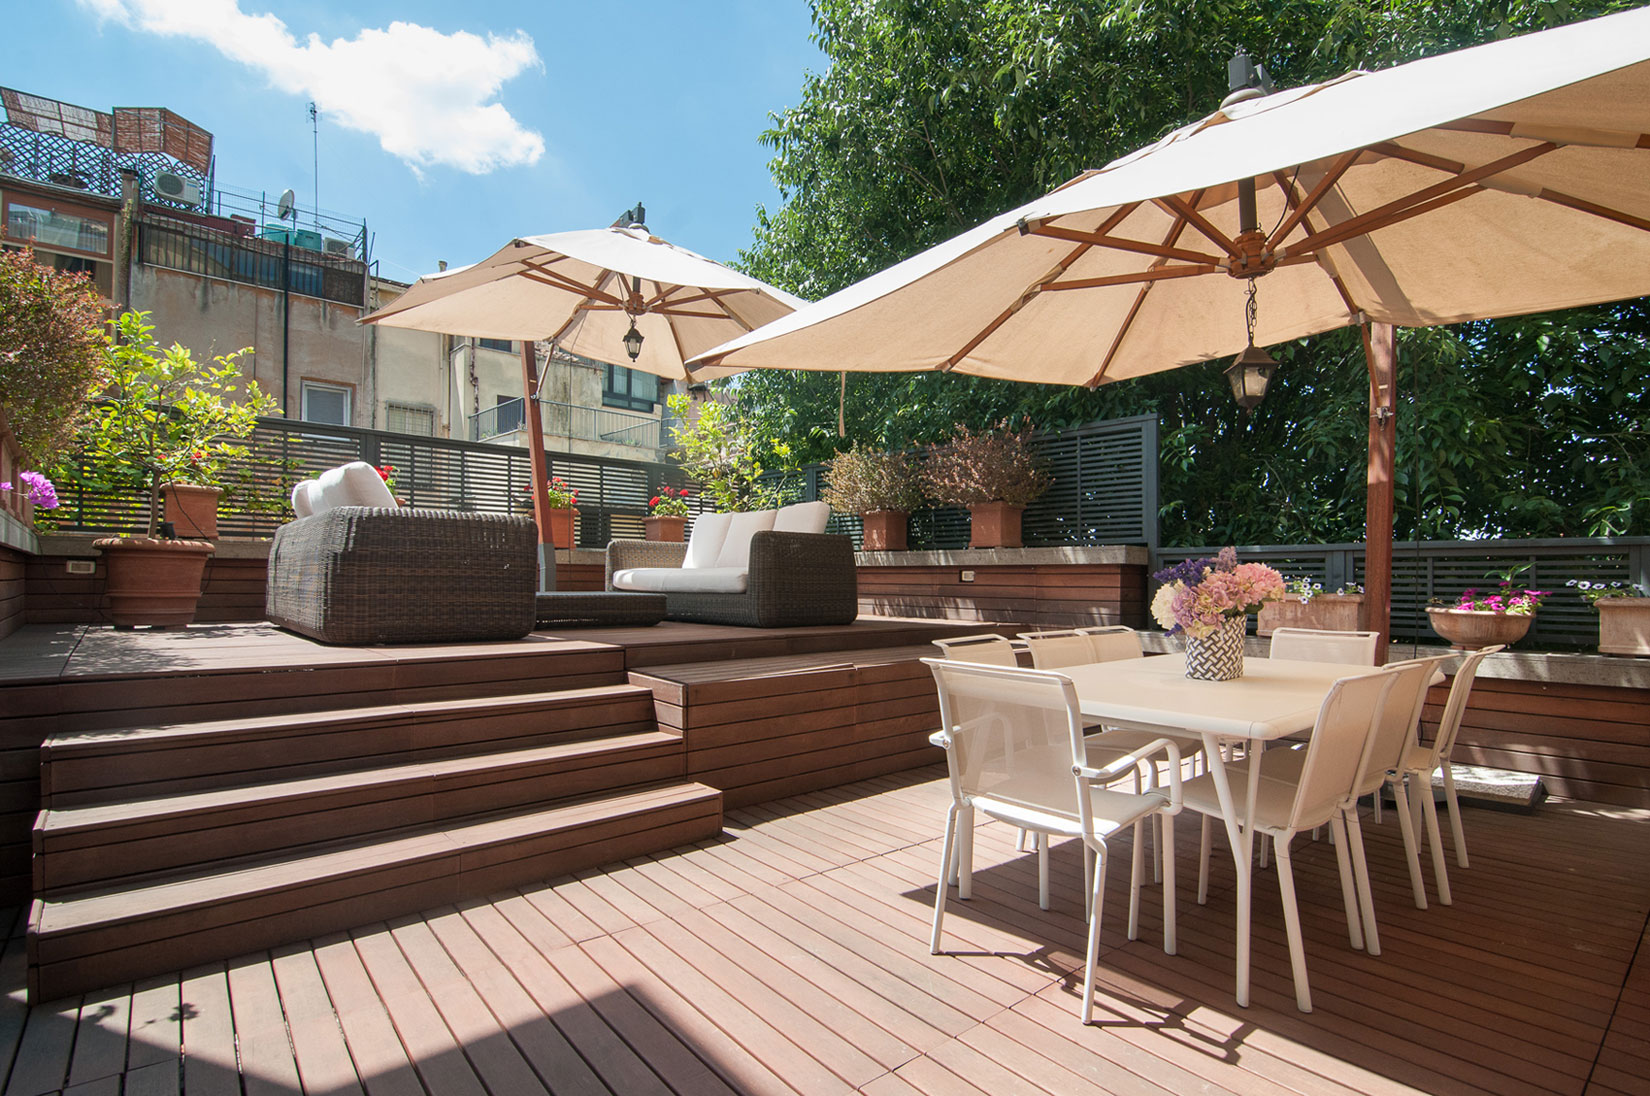 CM Apartment in Rome by 3C+t Capolei Cavalli a.a.-01